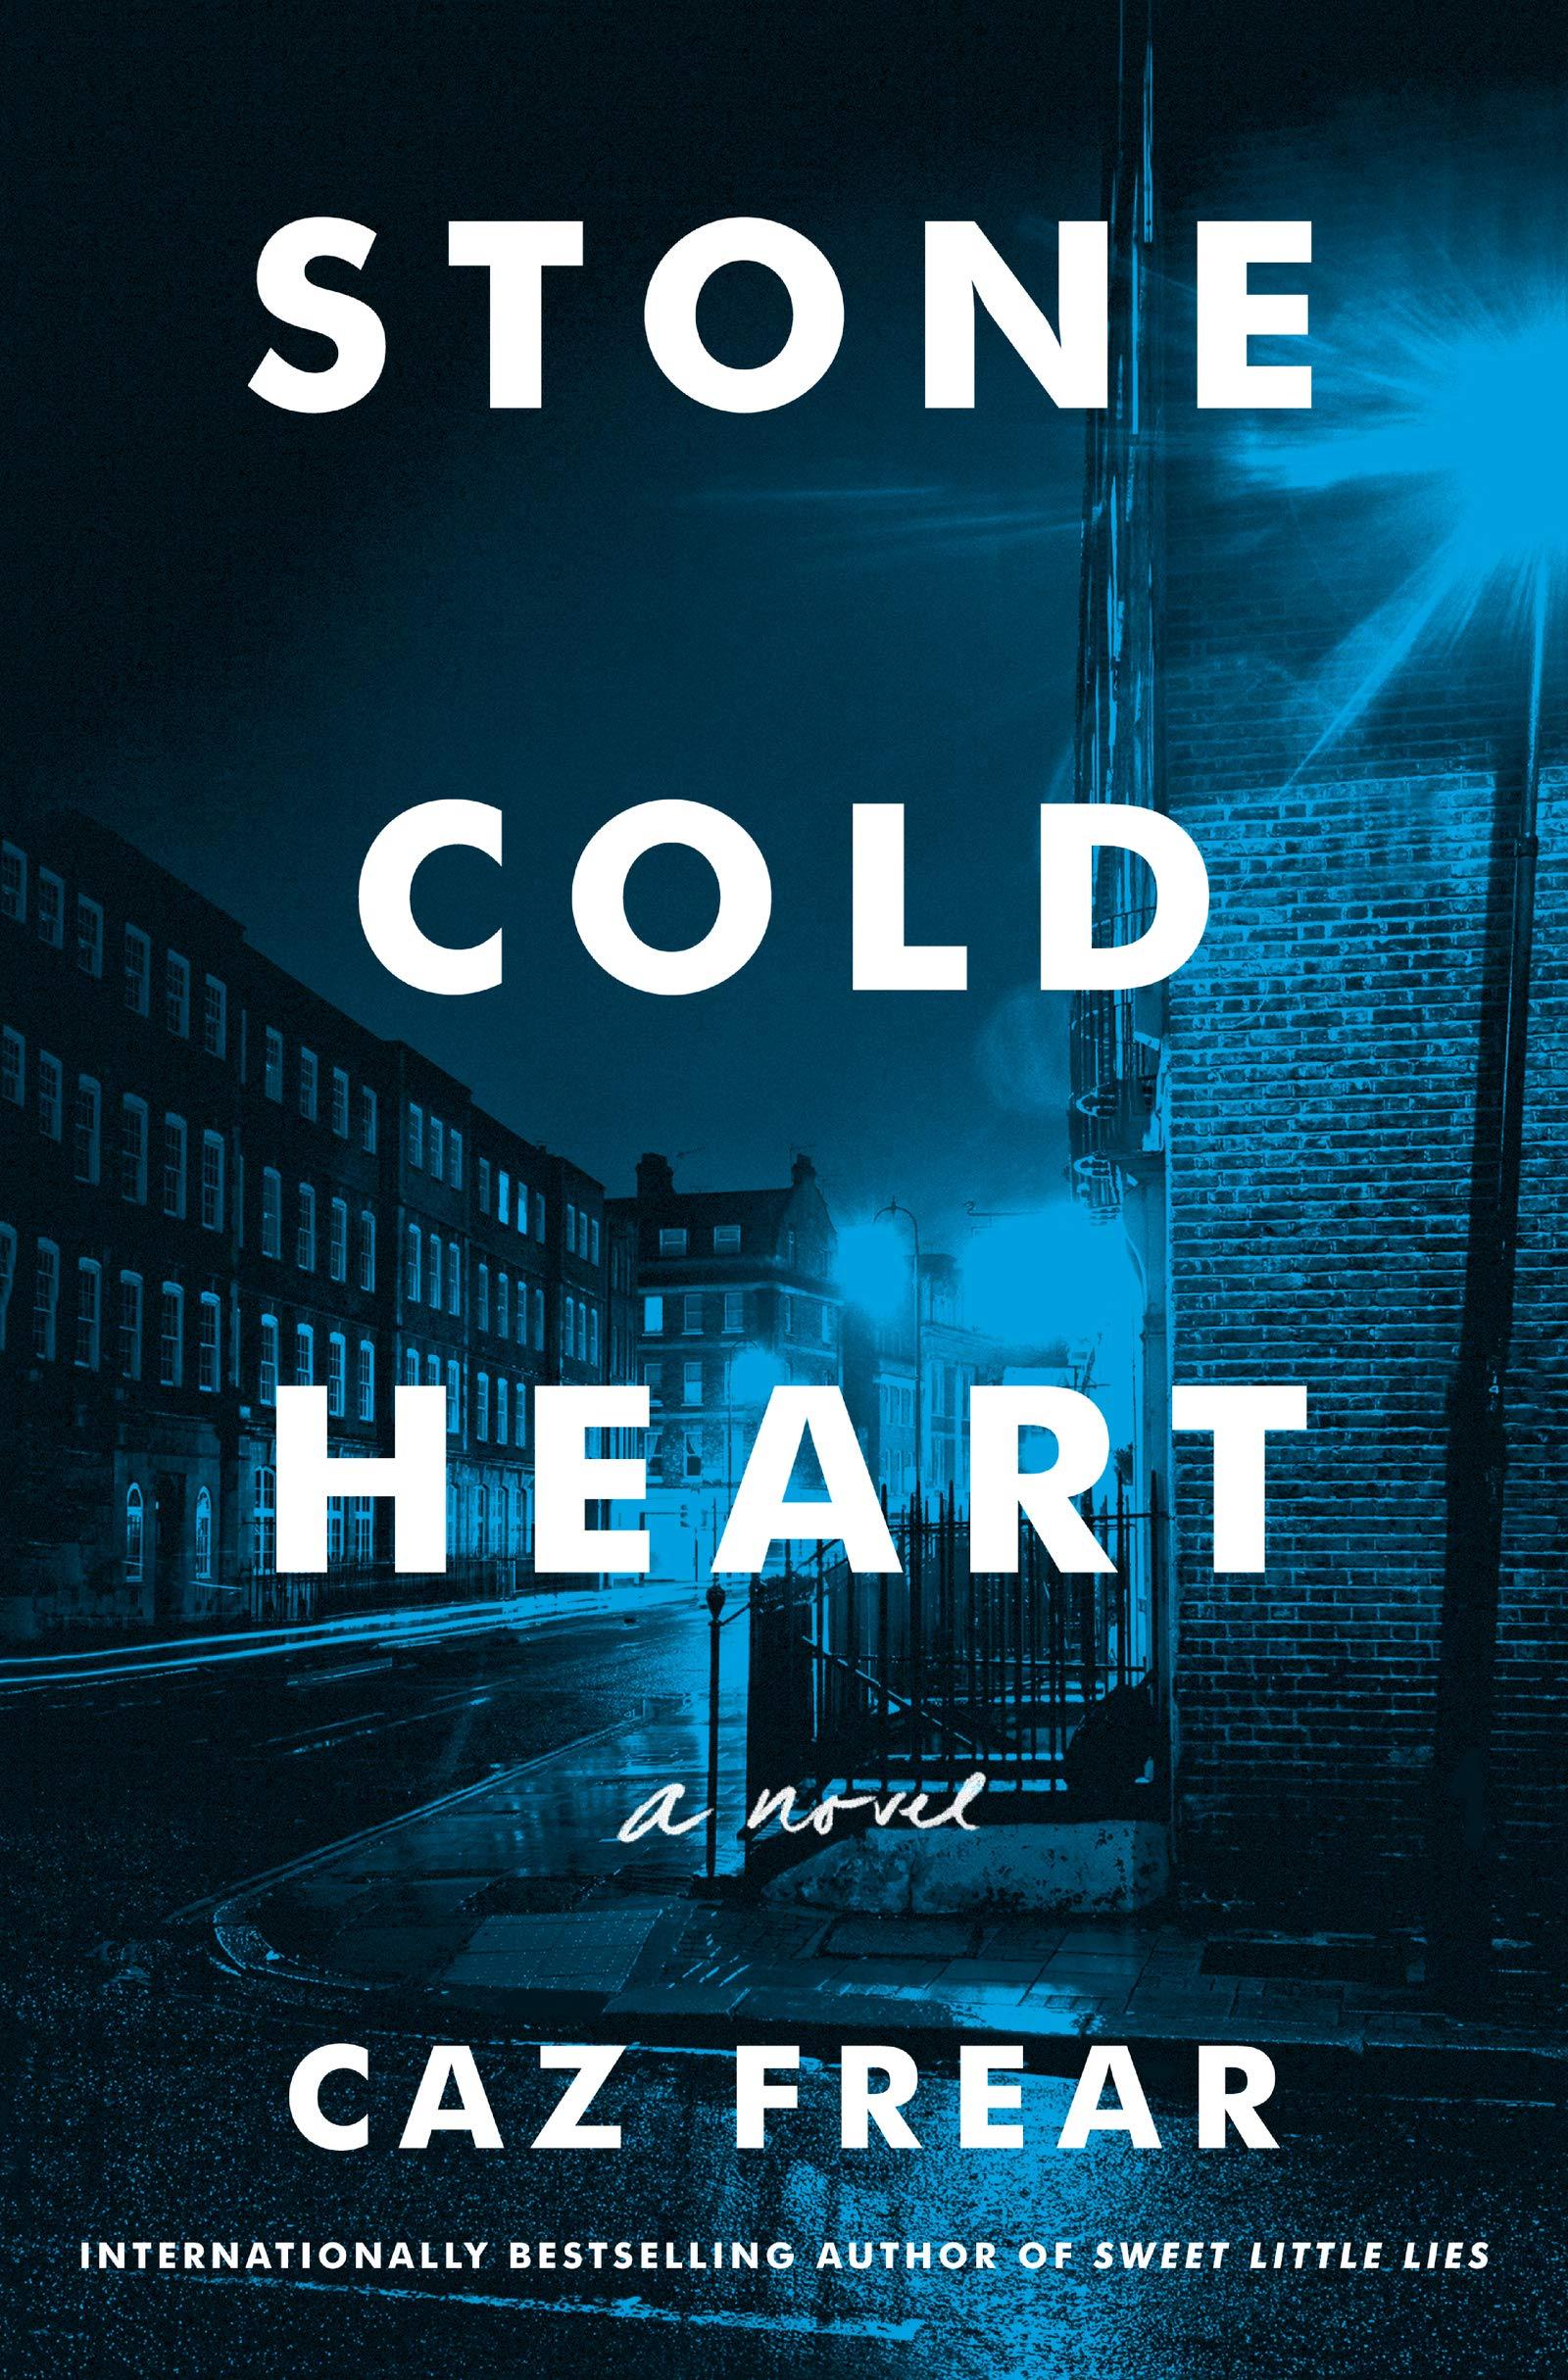 Amazon.com: Stone Cold Heart: A Novel (9780062849885): Frear, Caz ...